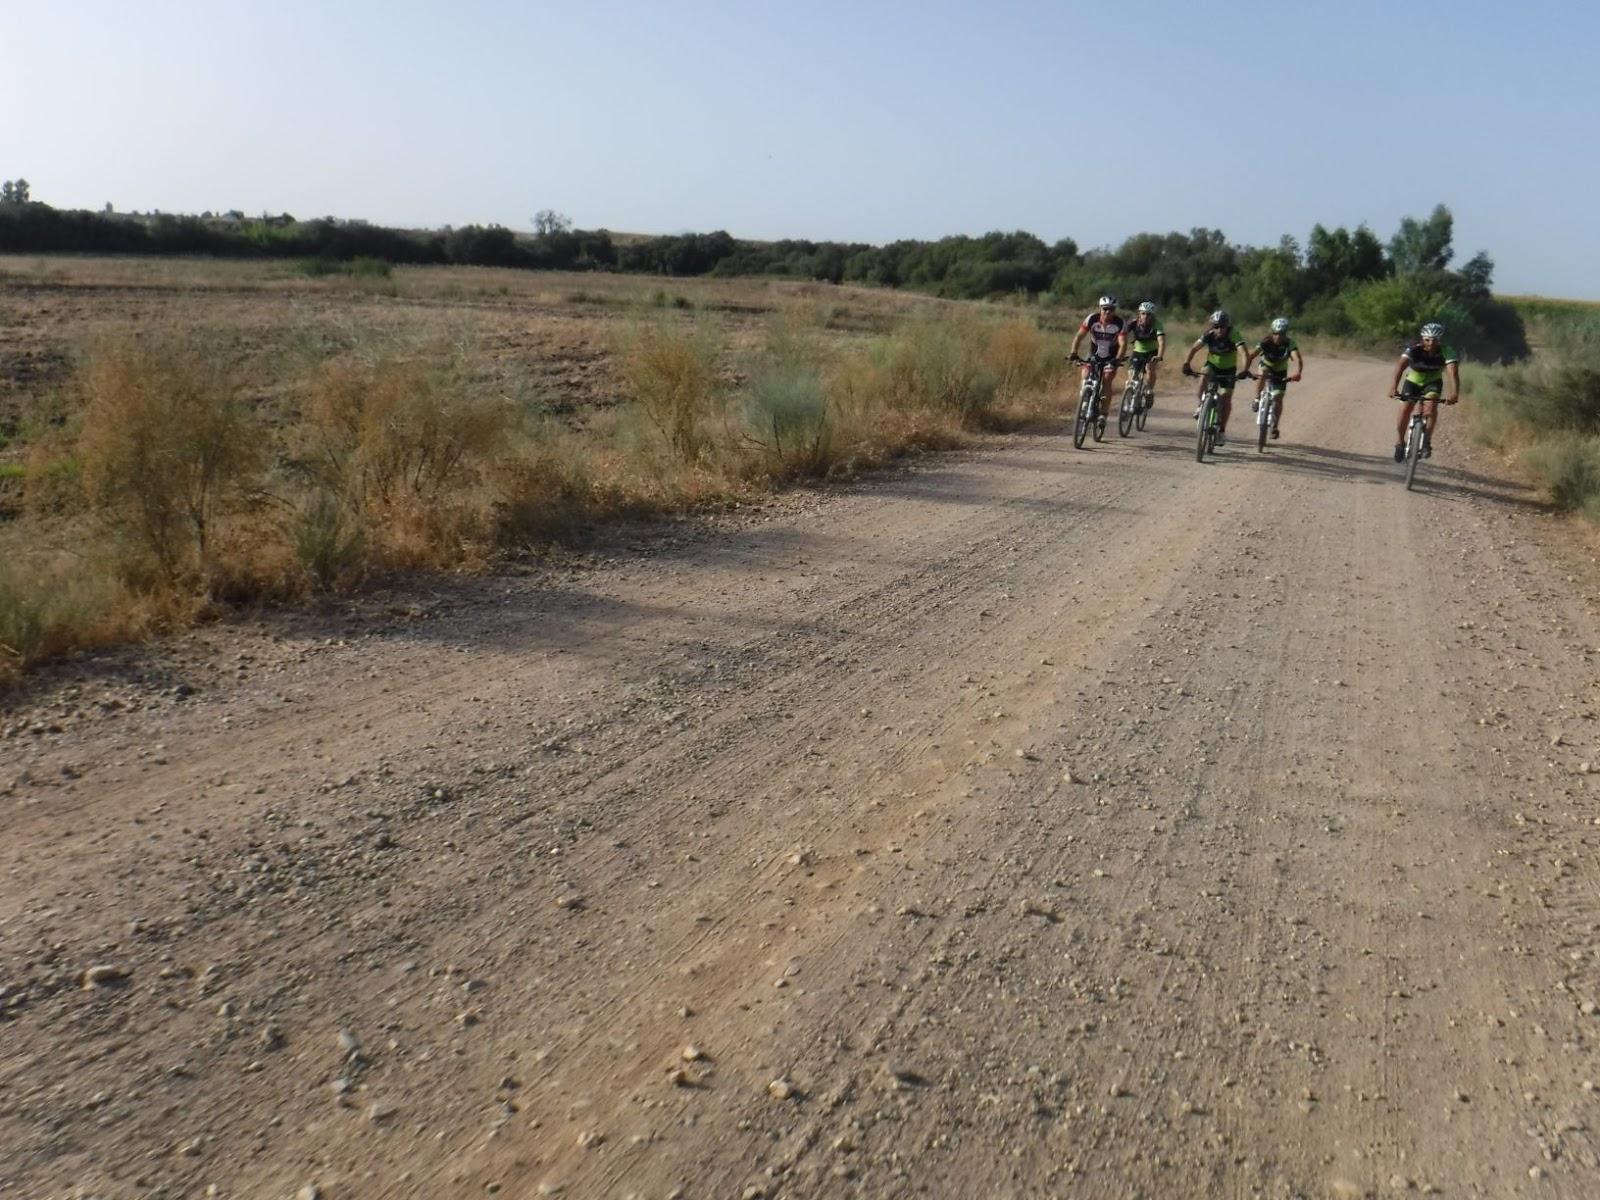 Santa amalia pe a cicloturista amaliense nos vamos a - Chino arroyomolinos ...